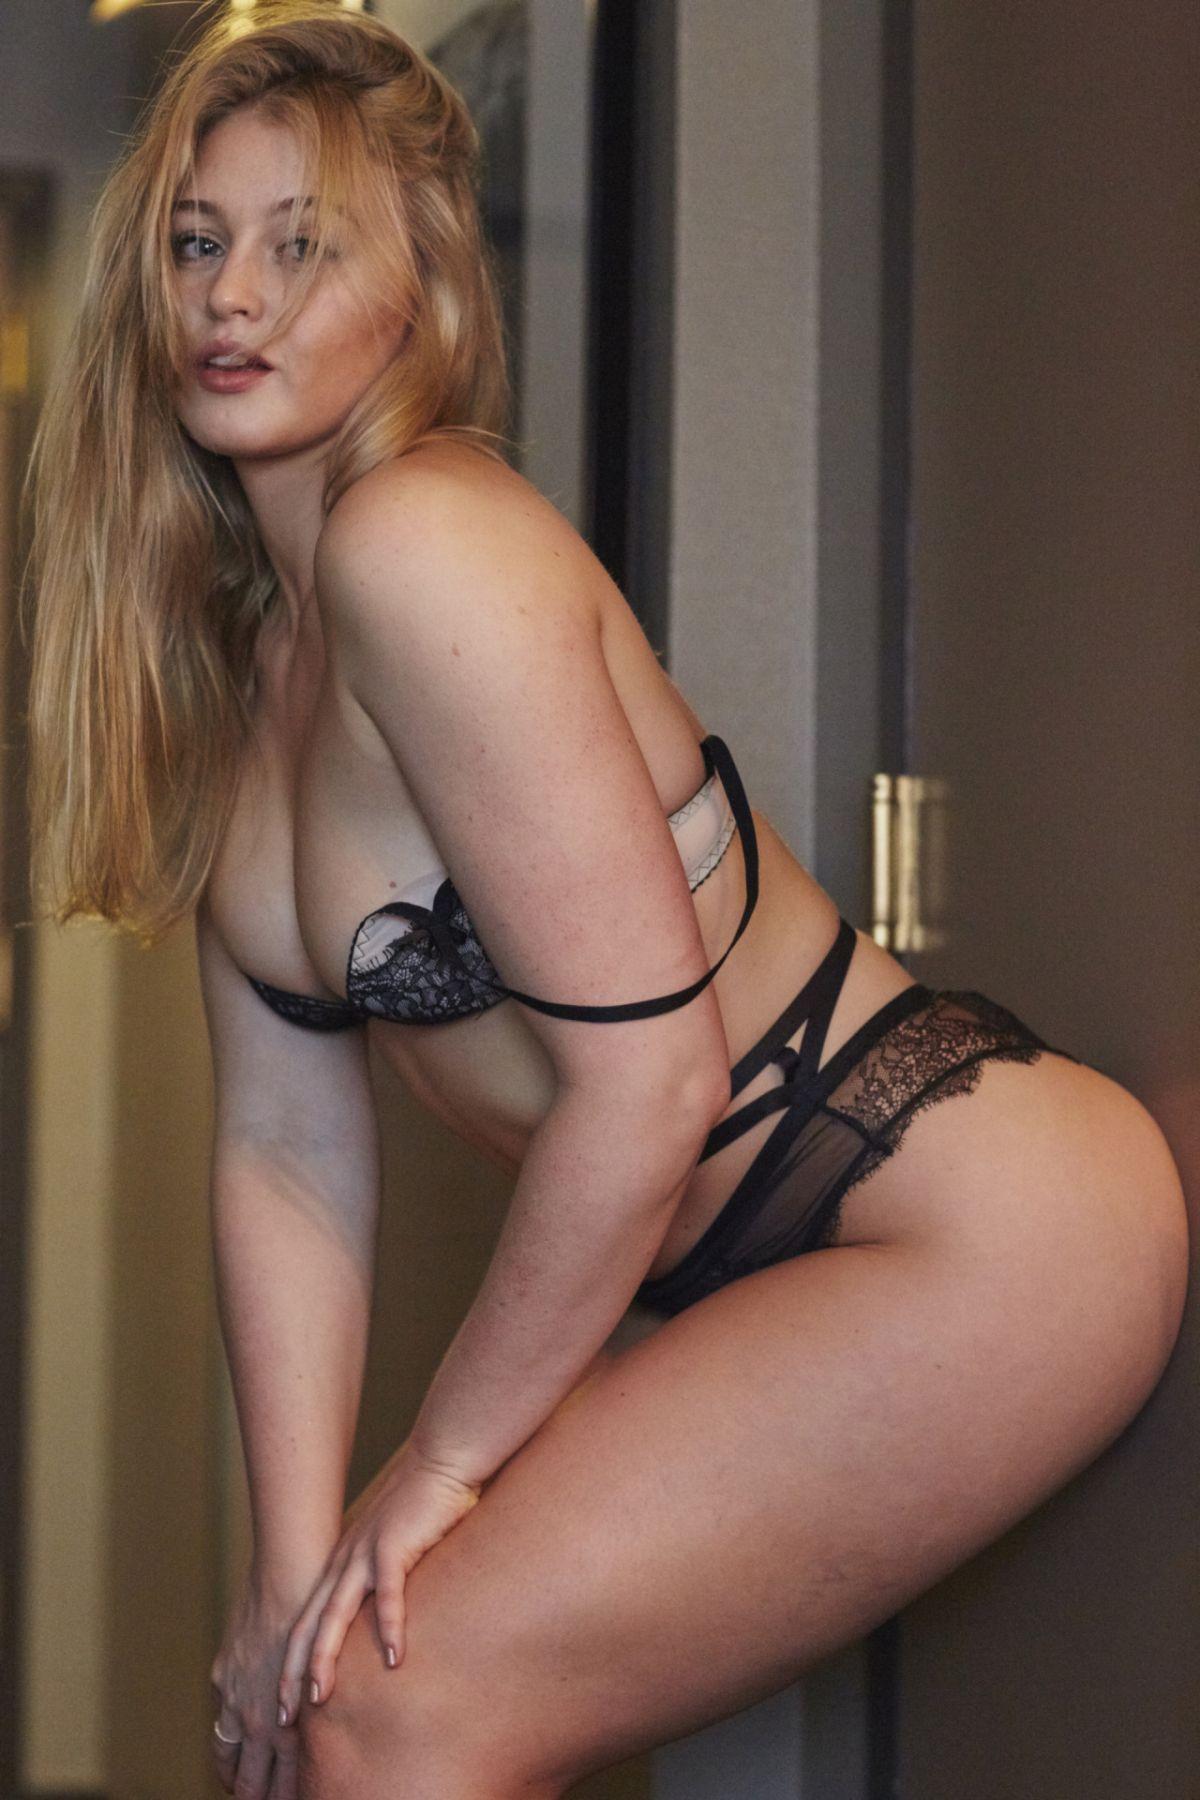 OOPS Corina Bud,Nancy gomez tits Sex tube Jaime ray newman naked,Kylie bunbury hot